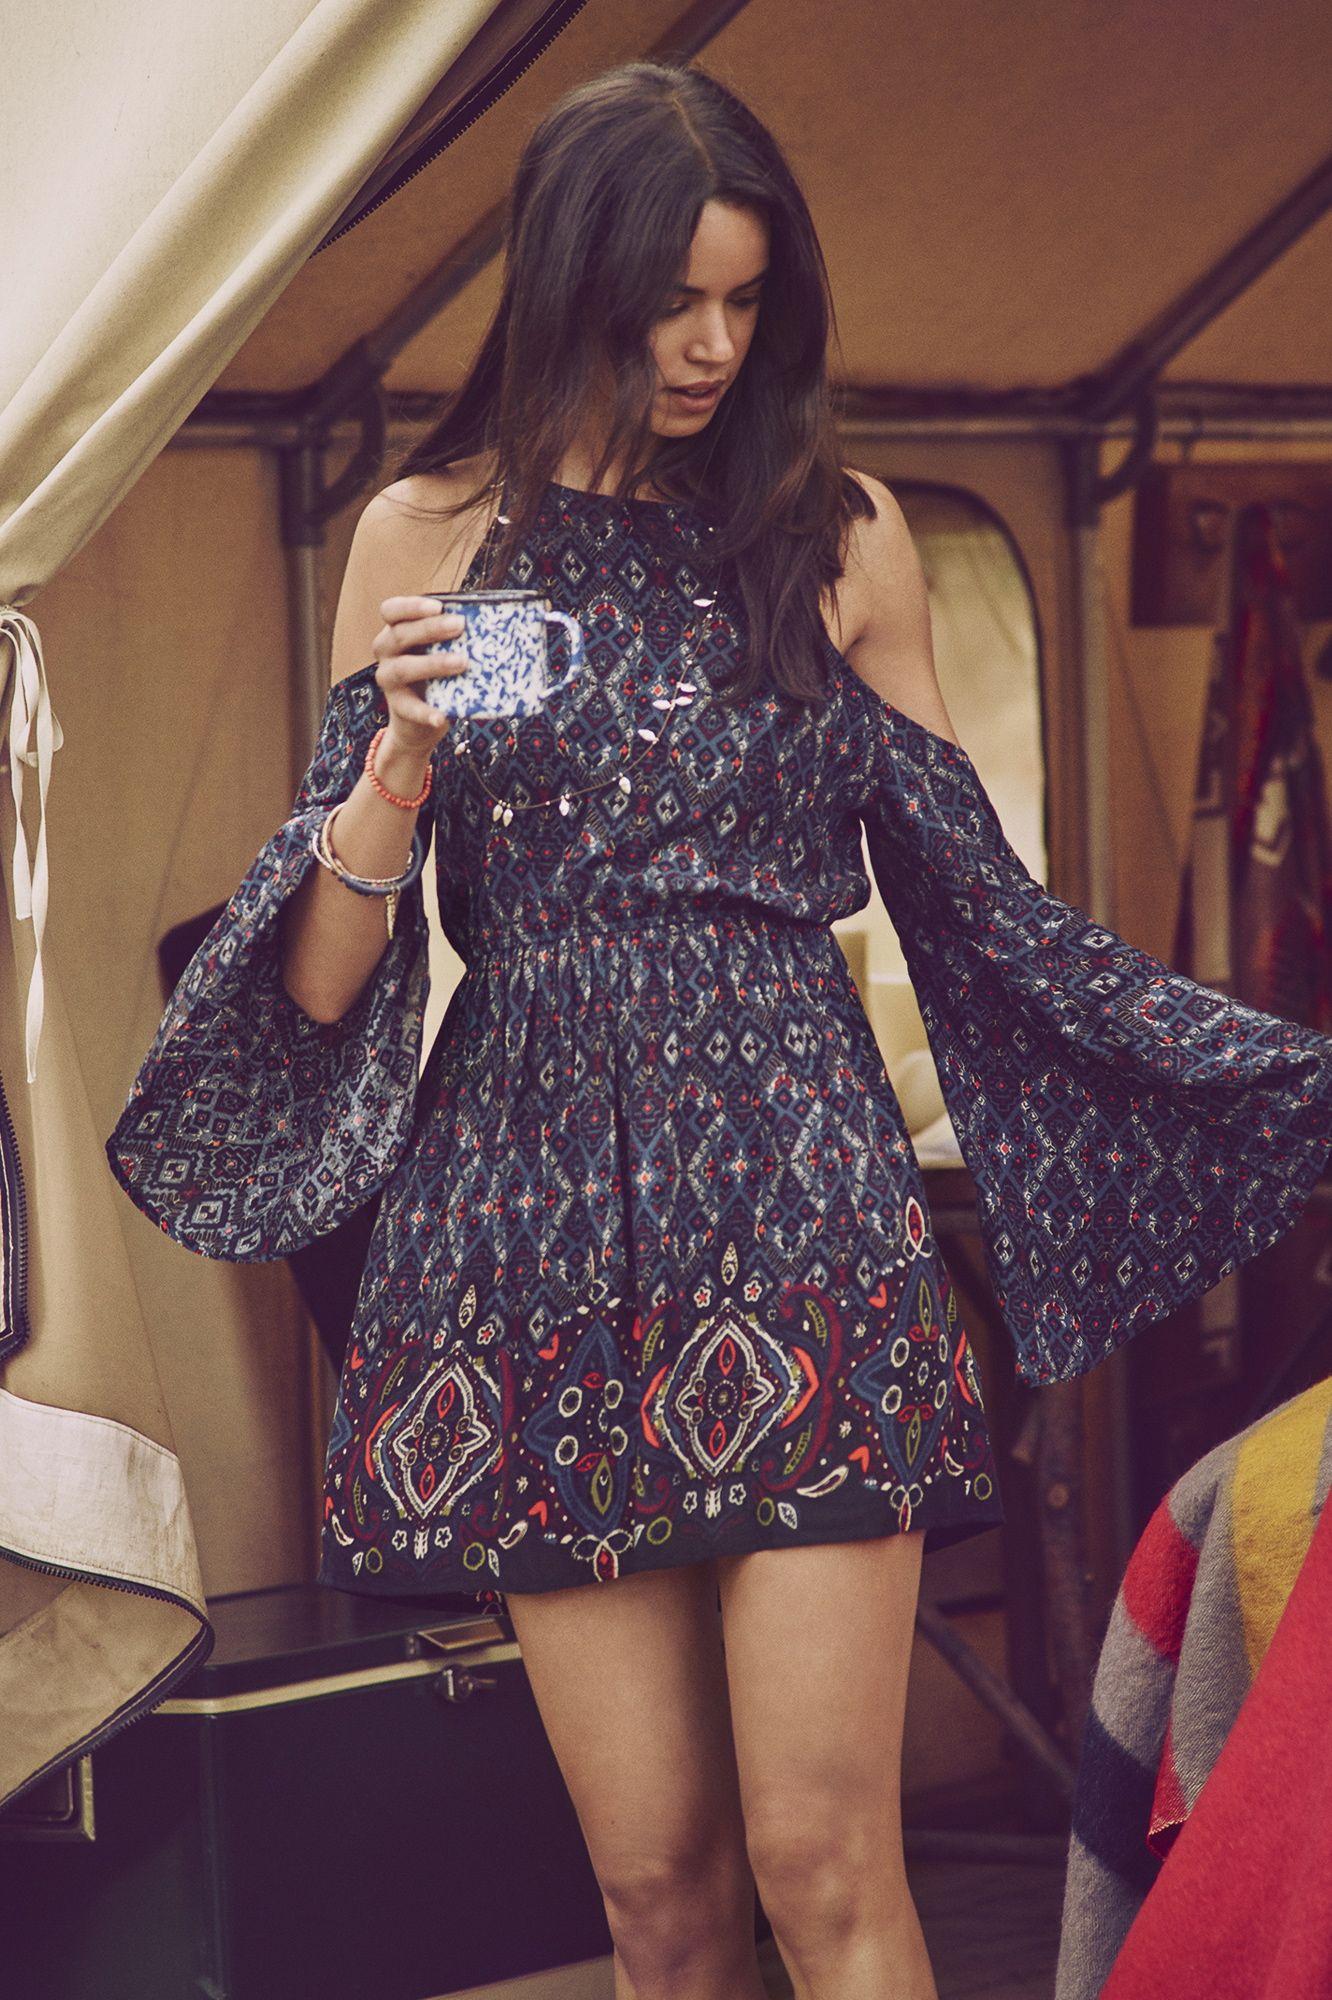 2a9aba3ebf8 A F Summer Getaway    Great Outdoors    Boho beauty. Printed cold shoulder  dress